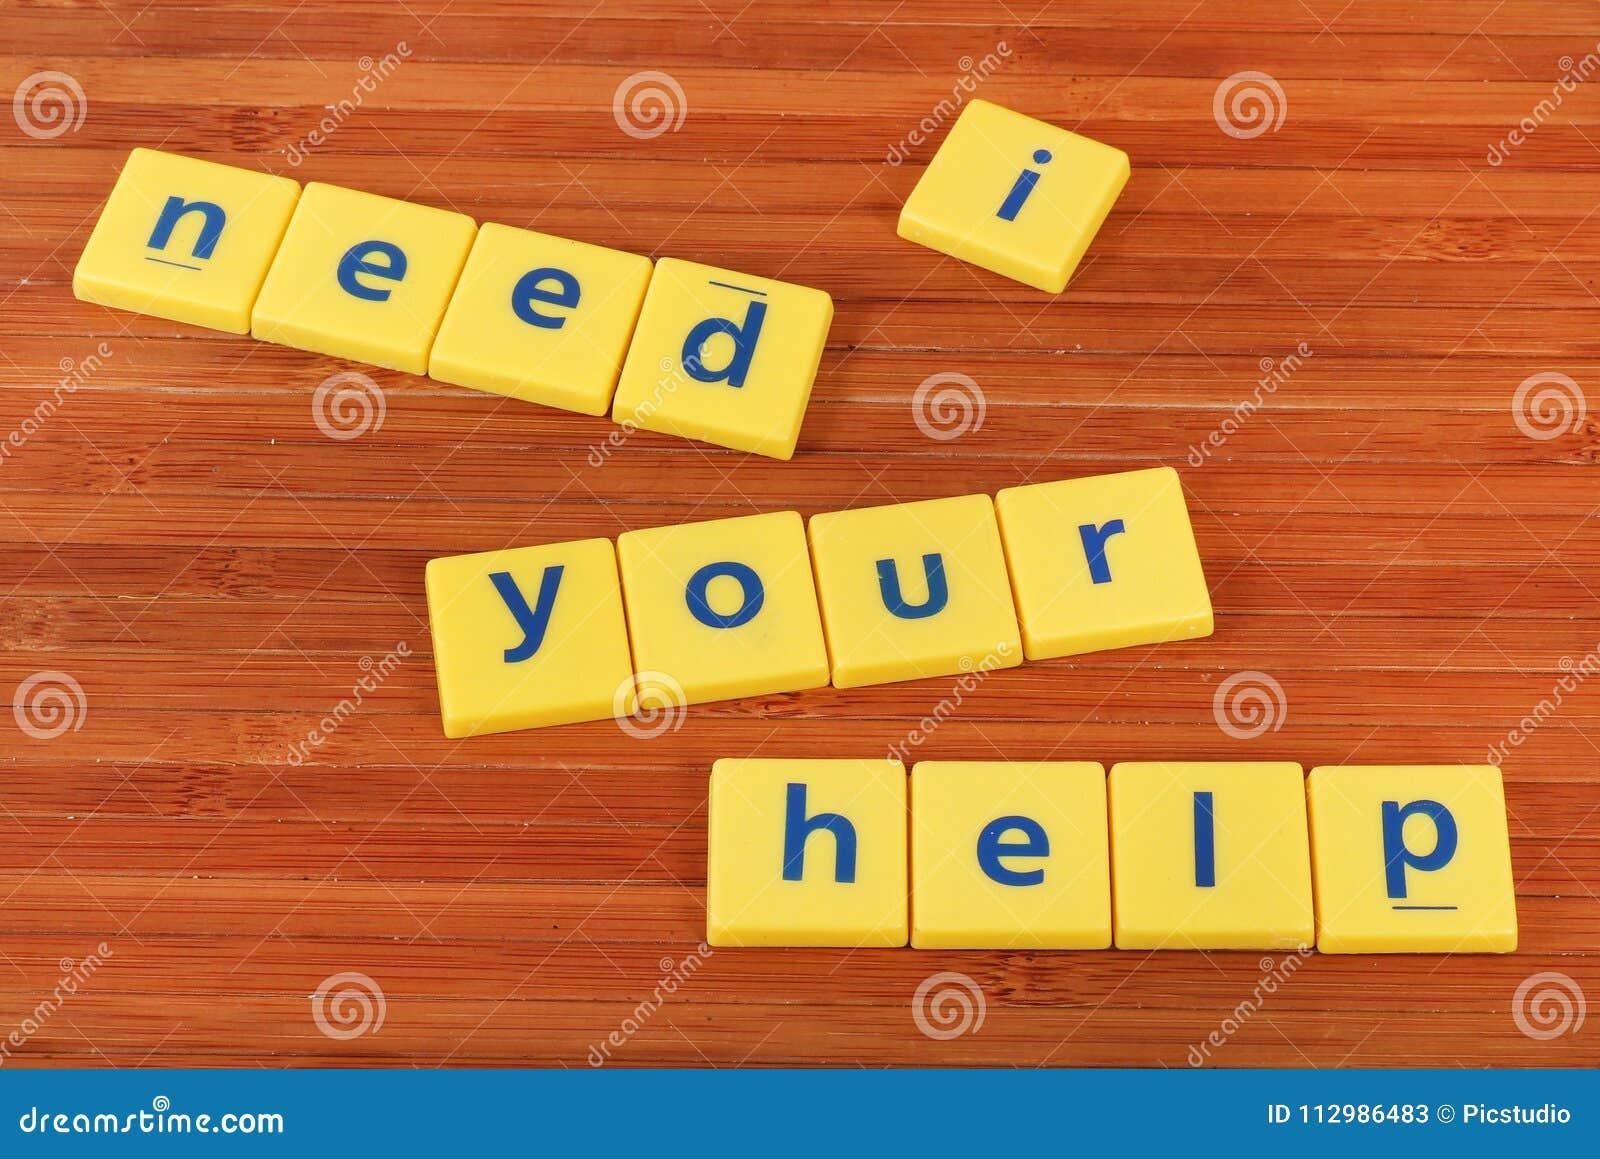 Help neede